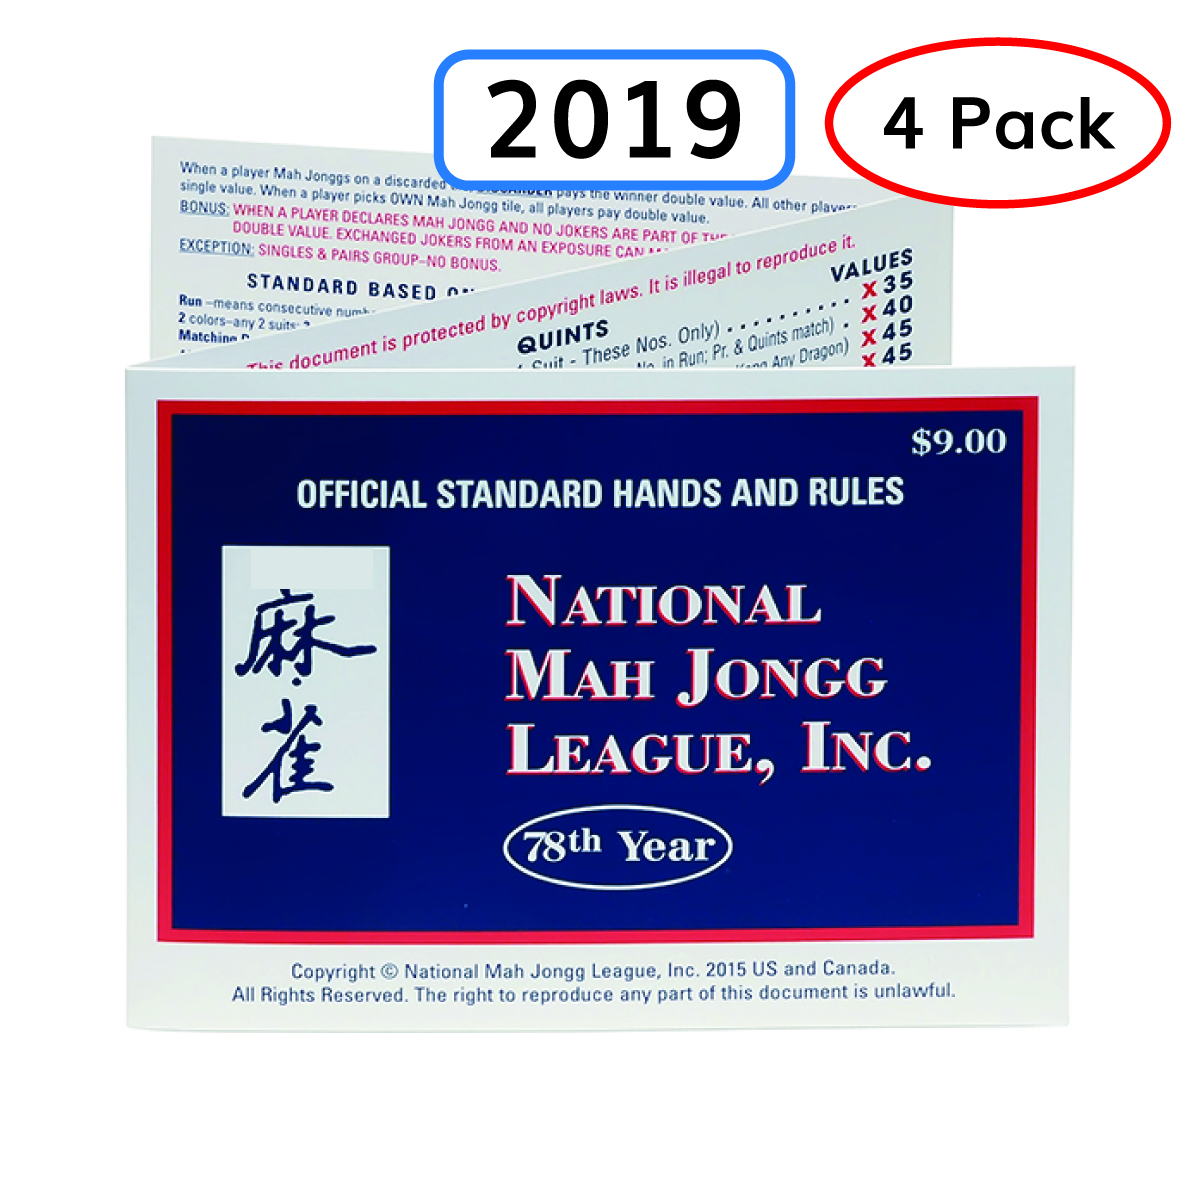 photograph regarding National Mah Jongg League Card Printable called 2019 Nationwide Mah Jongg League (NMJL) 4 Pack of Playing cards